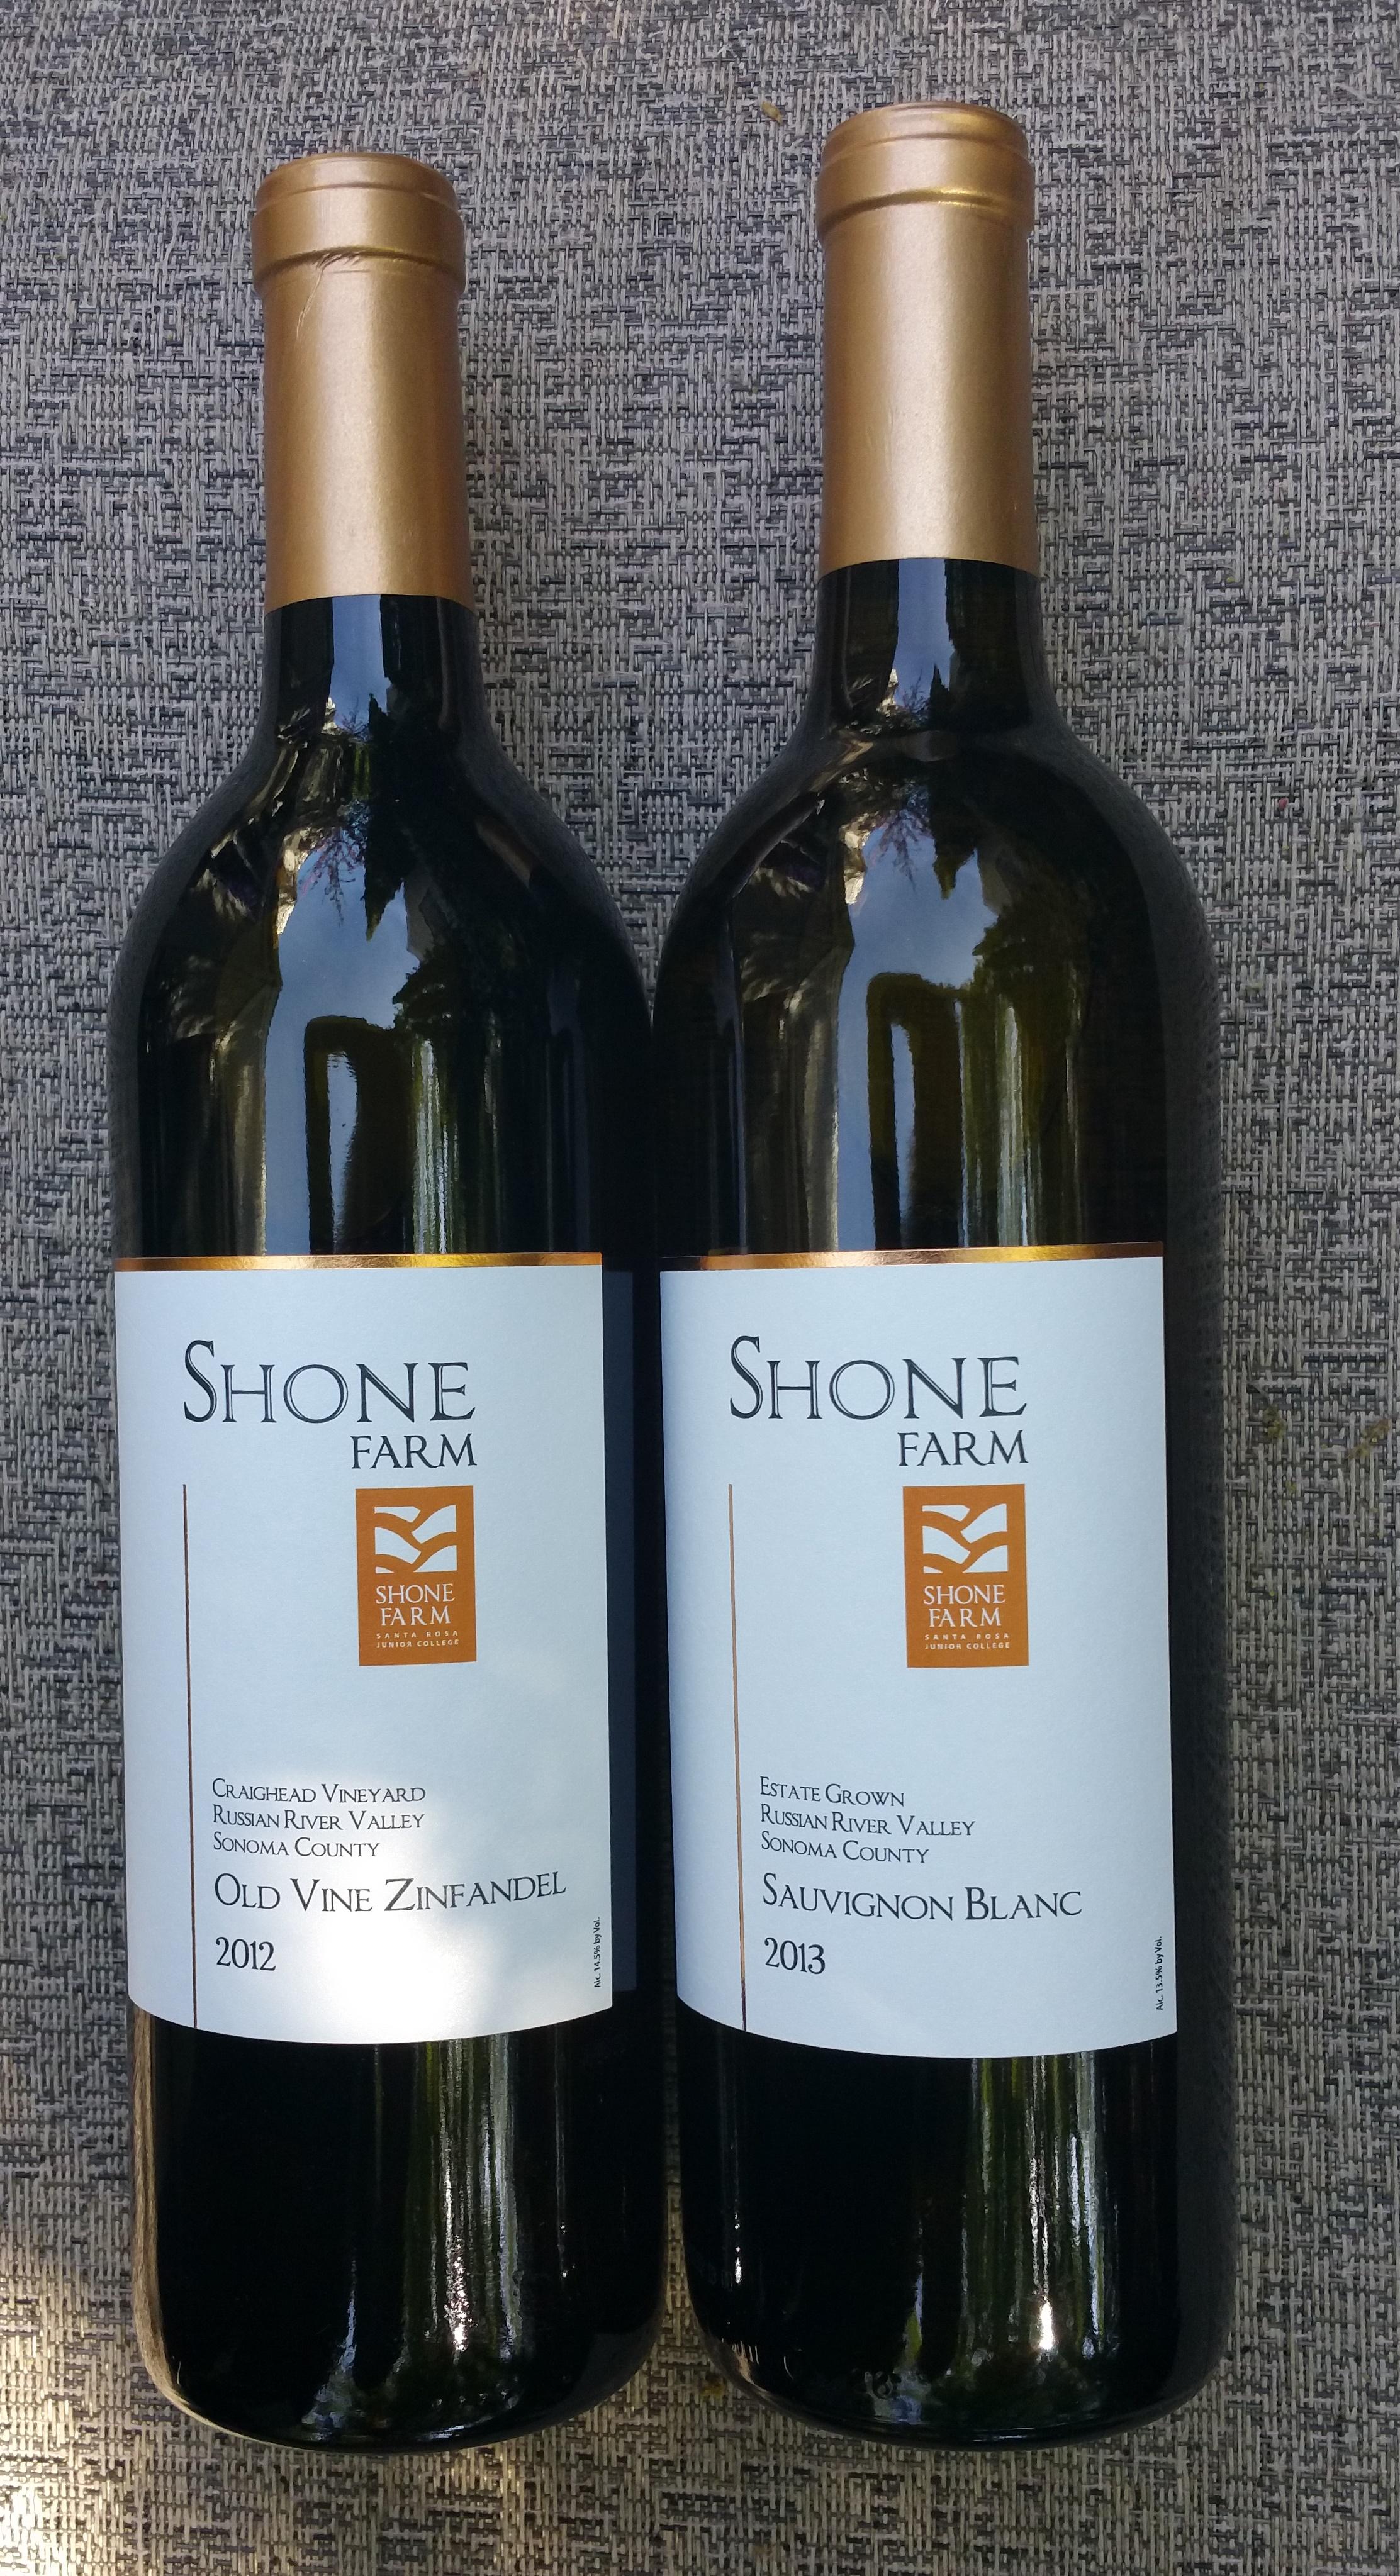 http://asfccc.com/wp-content/uploads/2015/04/Shone-Farm-Wine-SRJC2.jpg